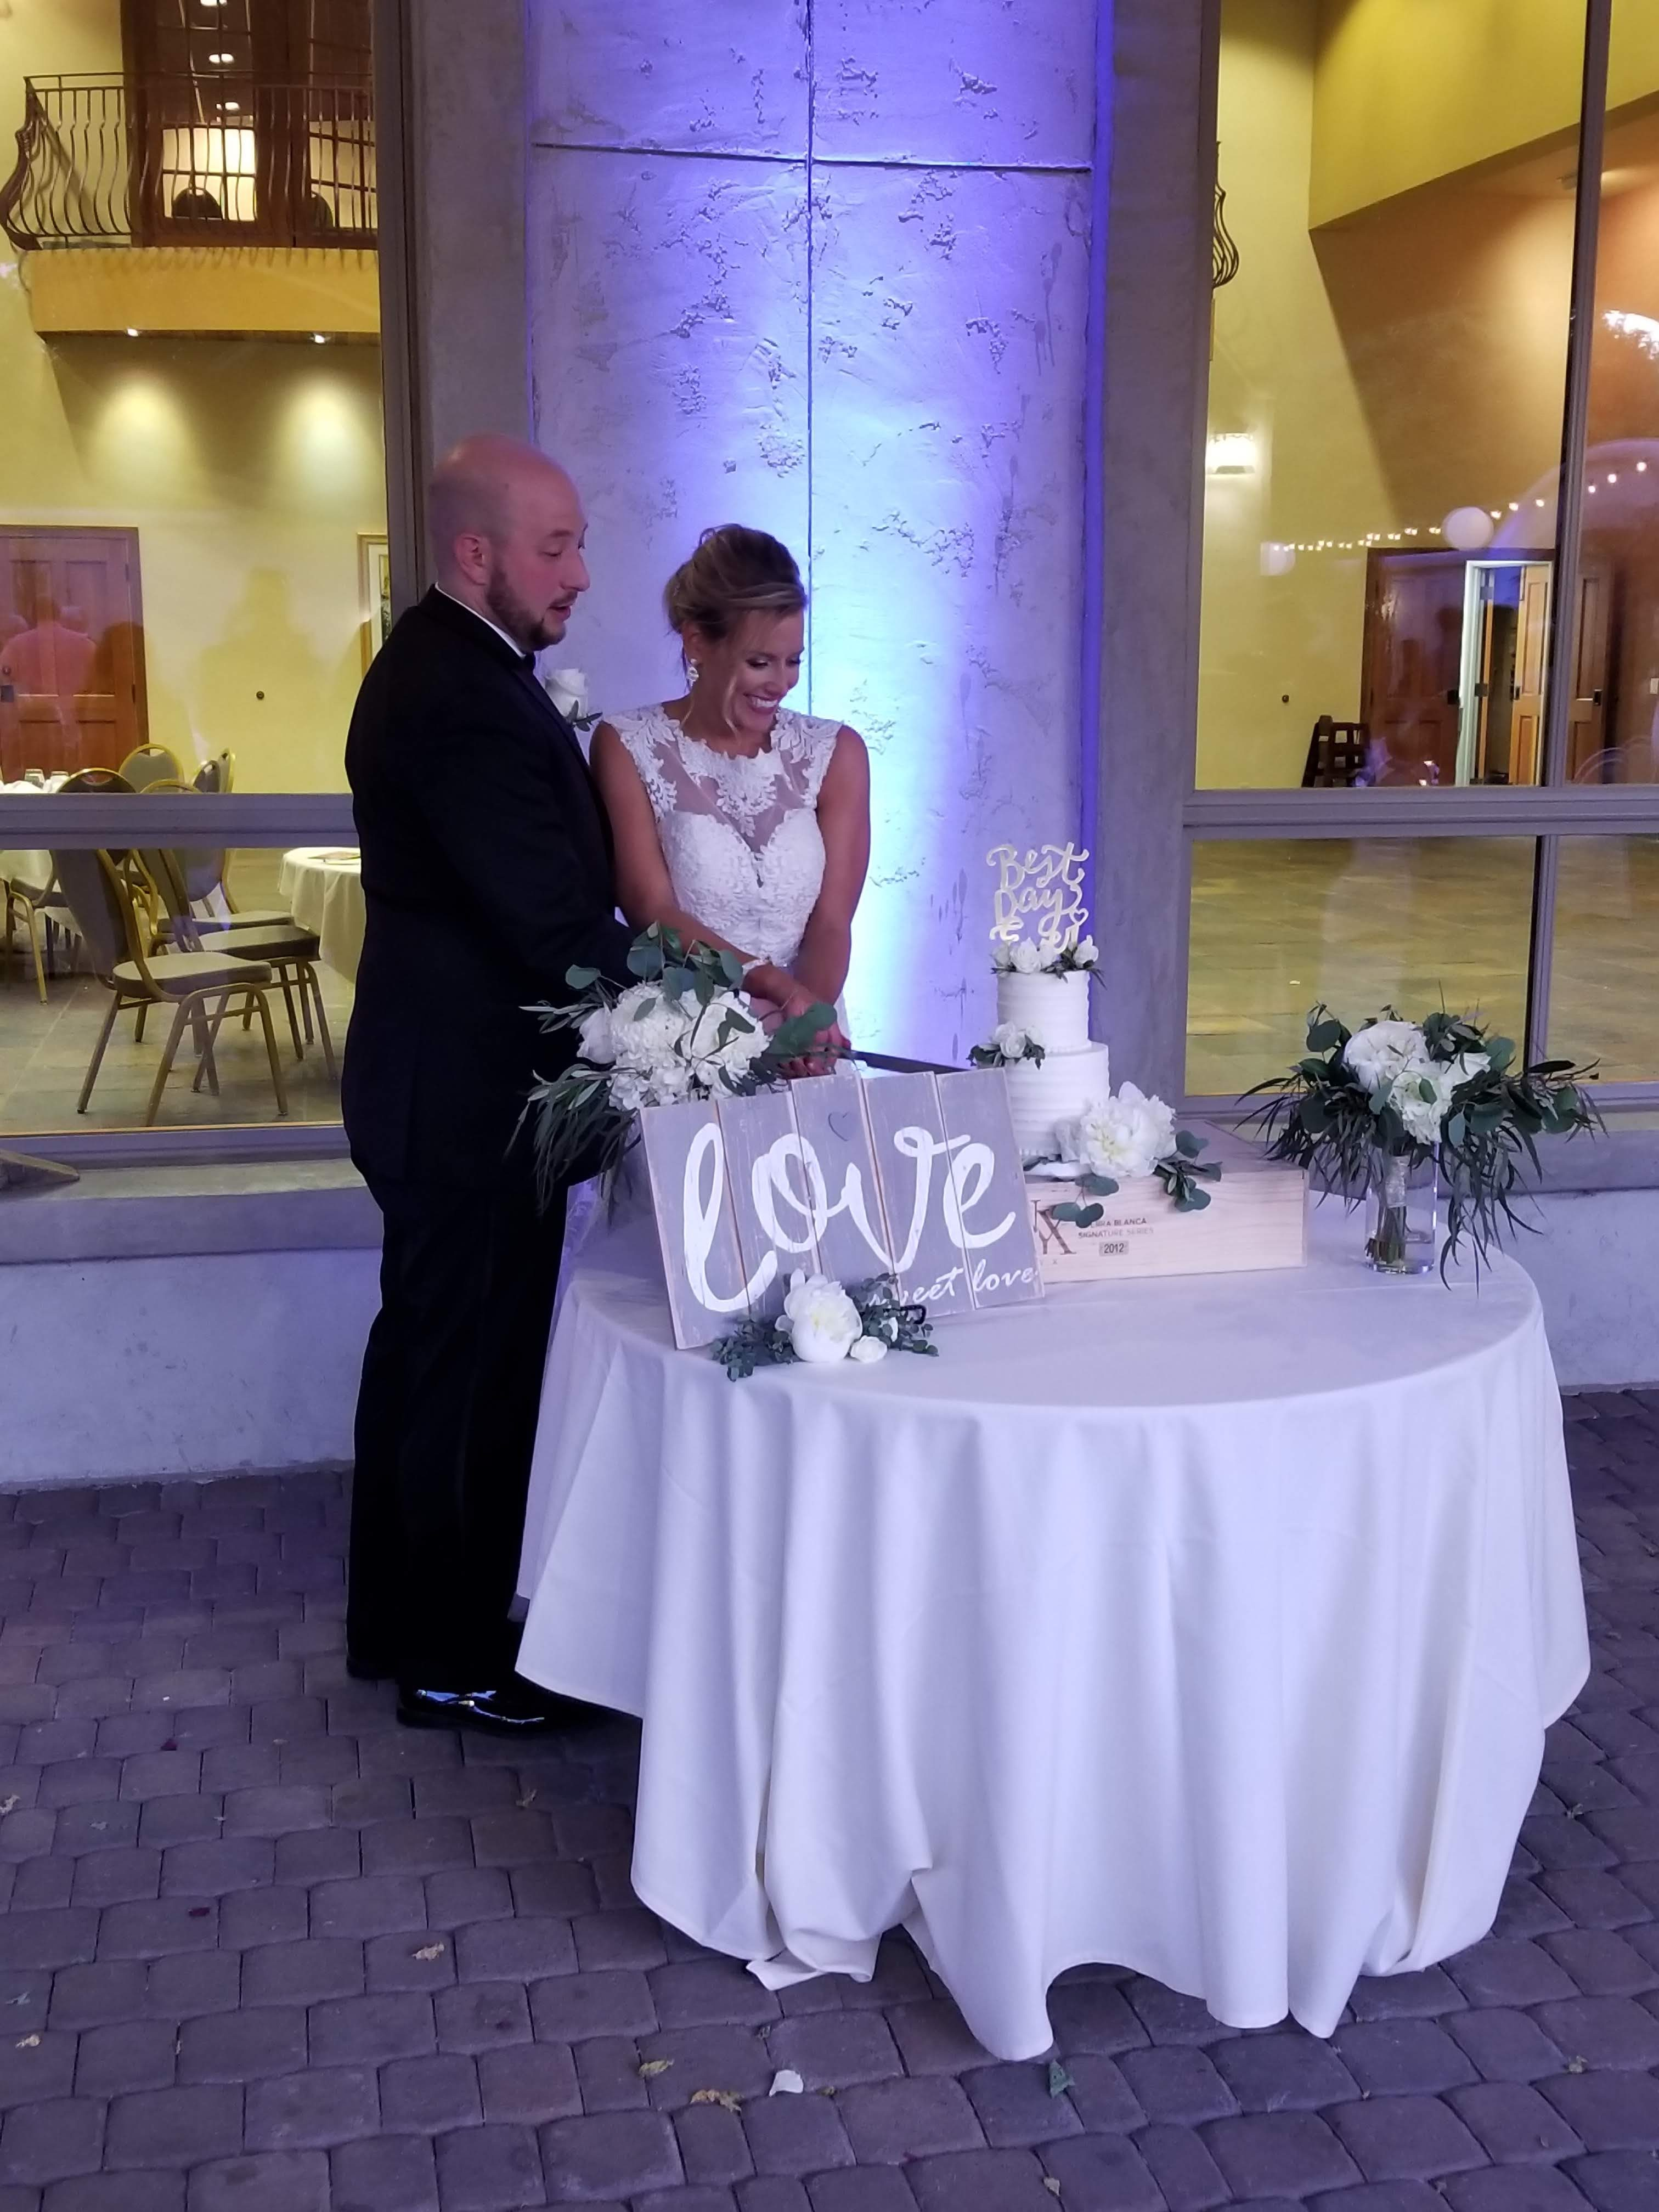 Kyla & Dustin's Wedding